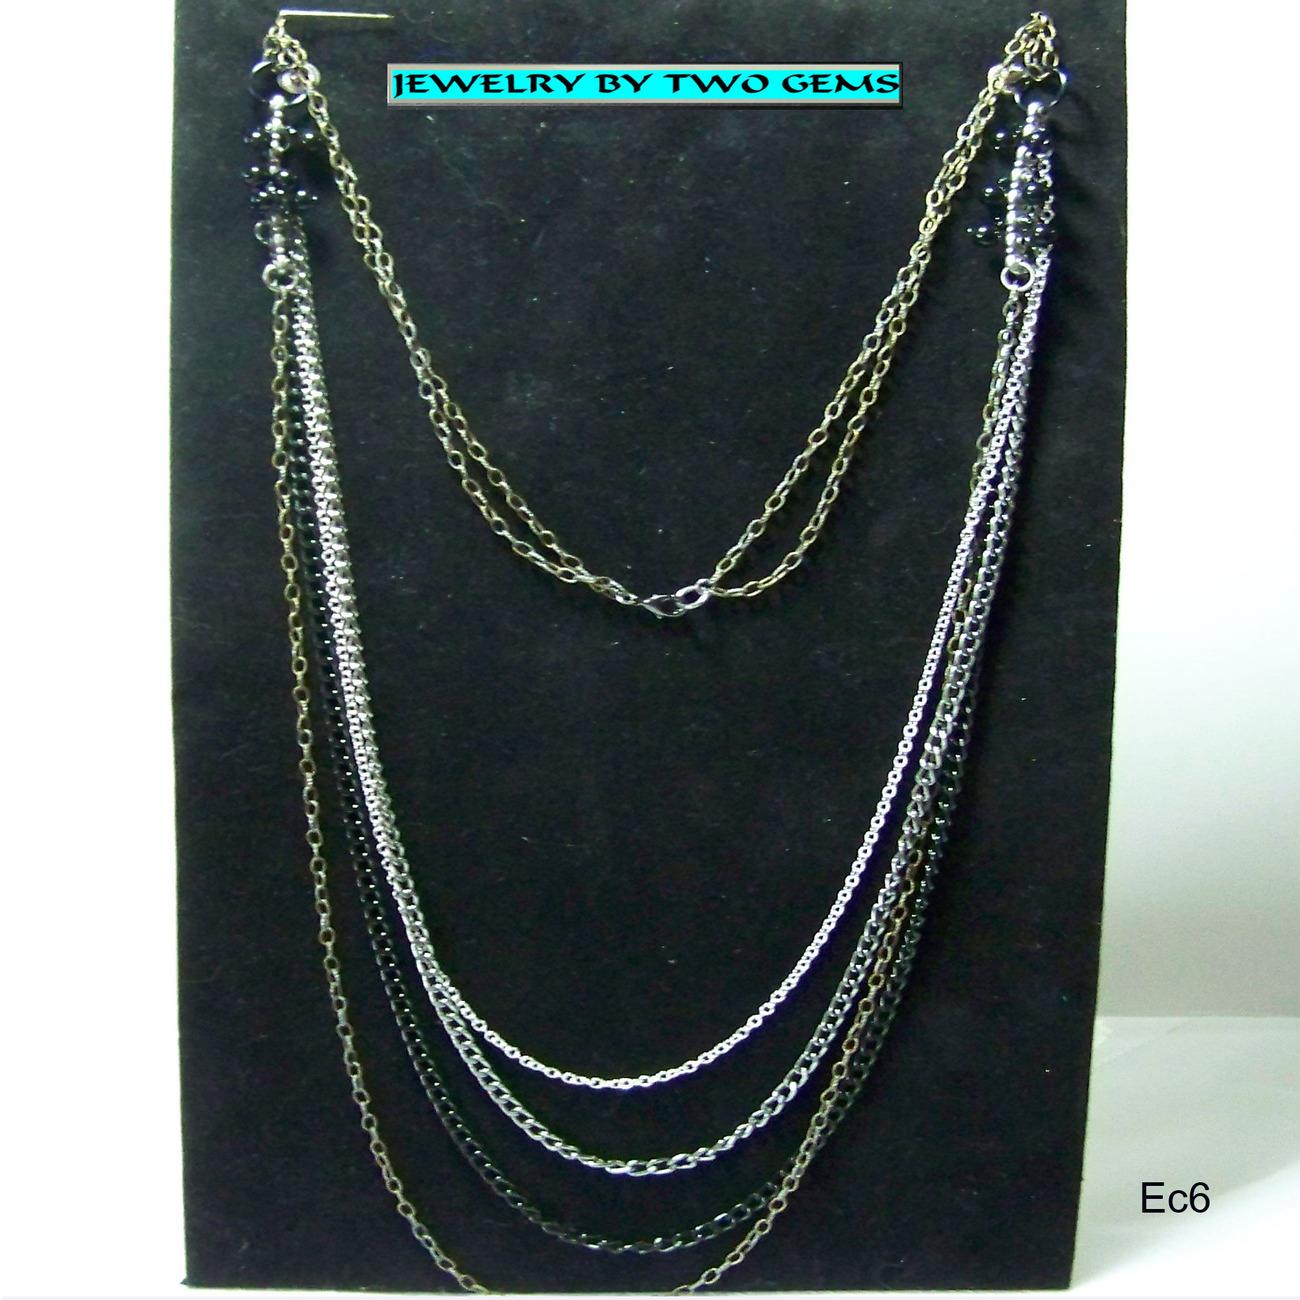 Jewelry By Two Gems (Ec6) Black-Silver-Gunmetal Multi Chain